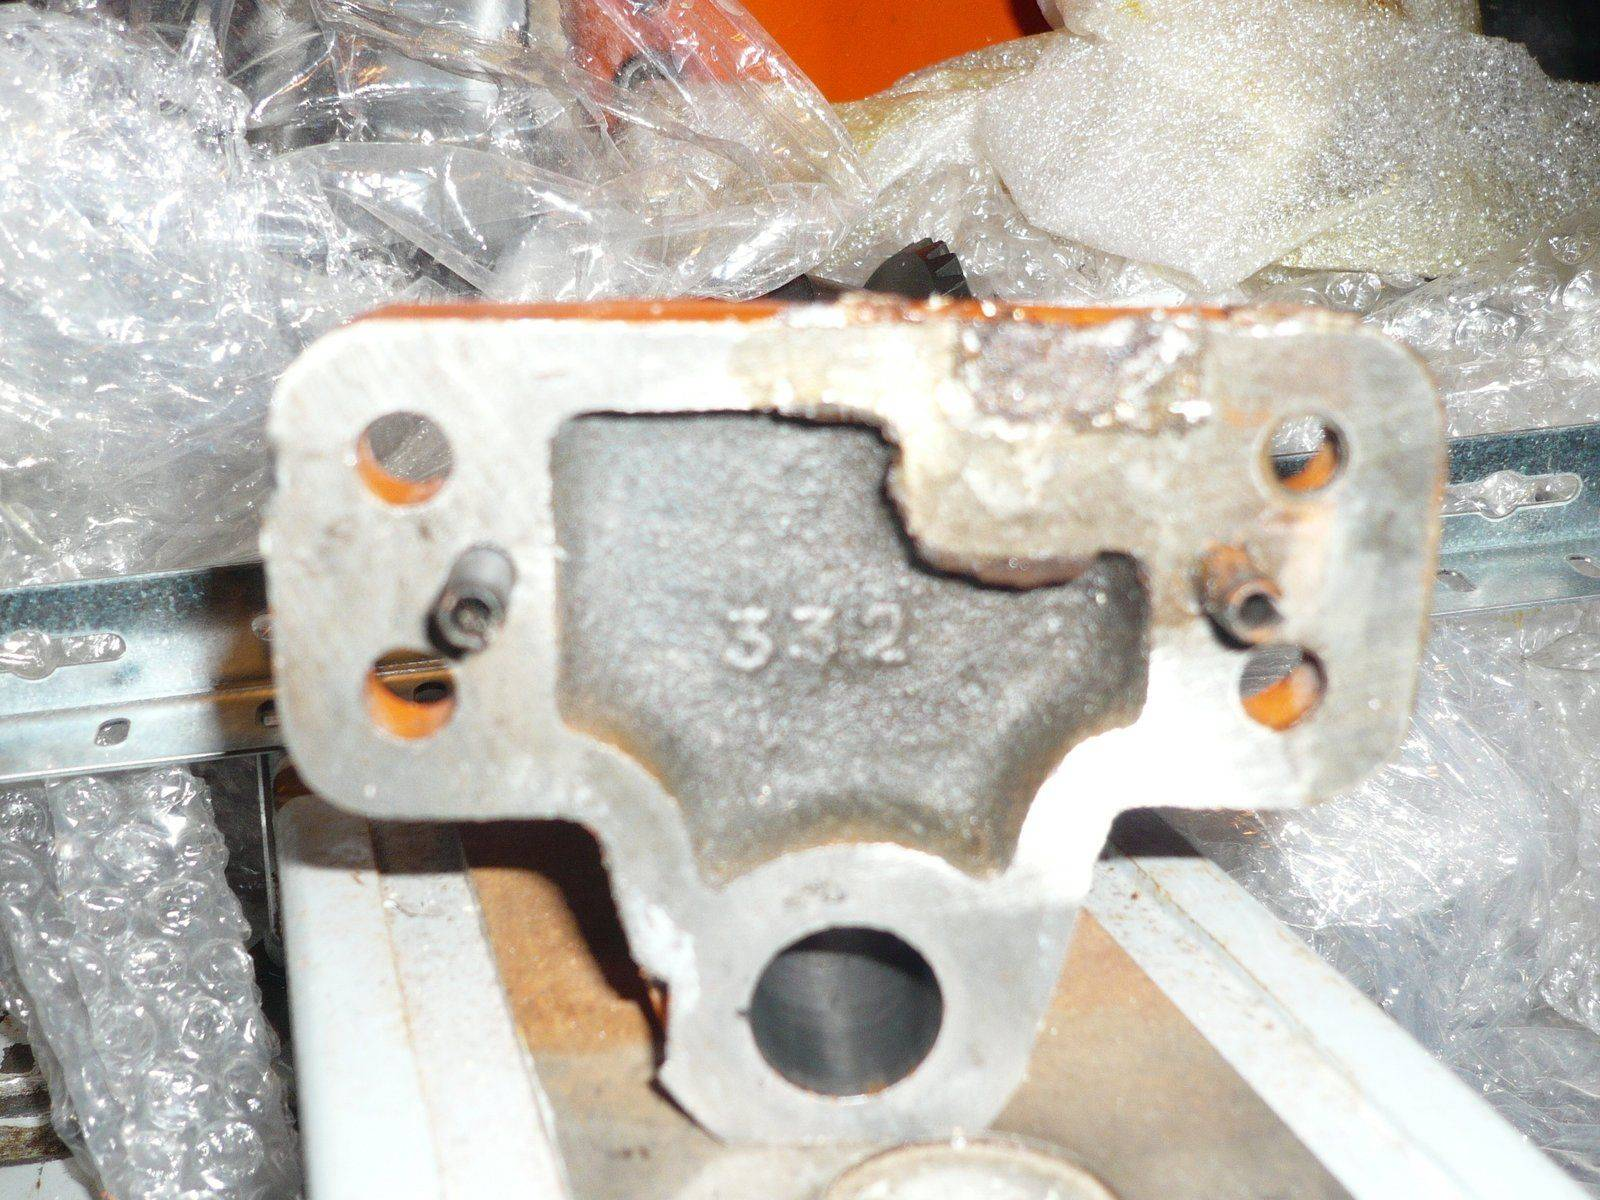 P1030147.JPG